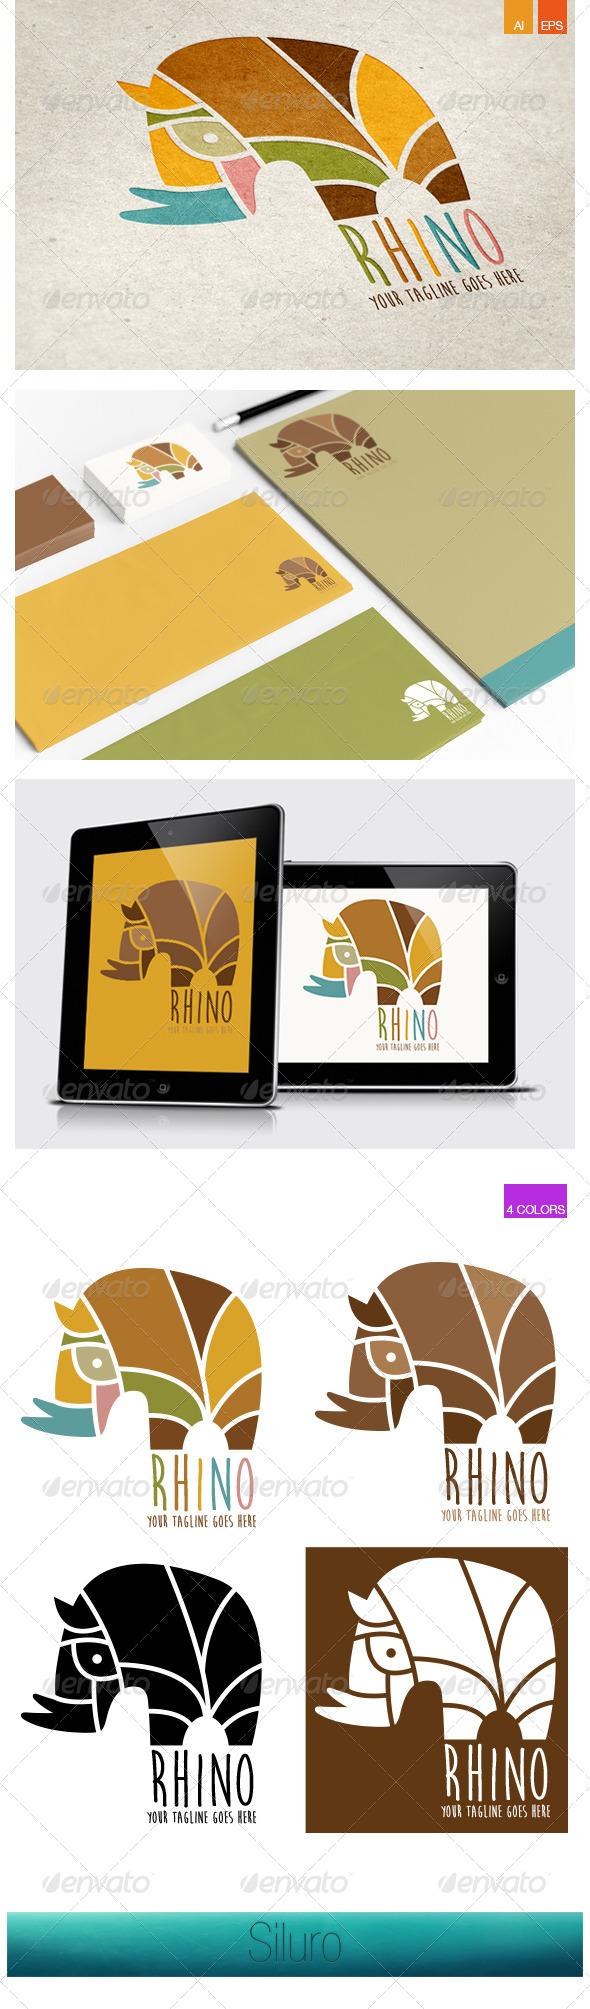 GraphicRiver Rhino Logo 7998302